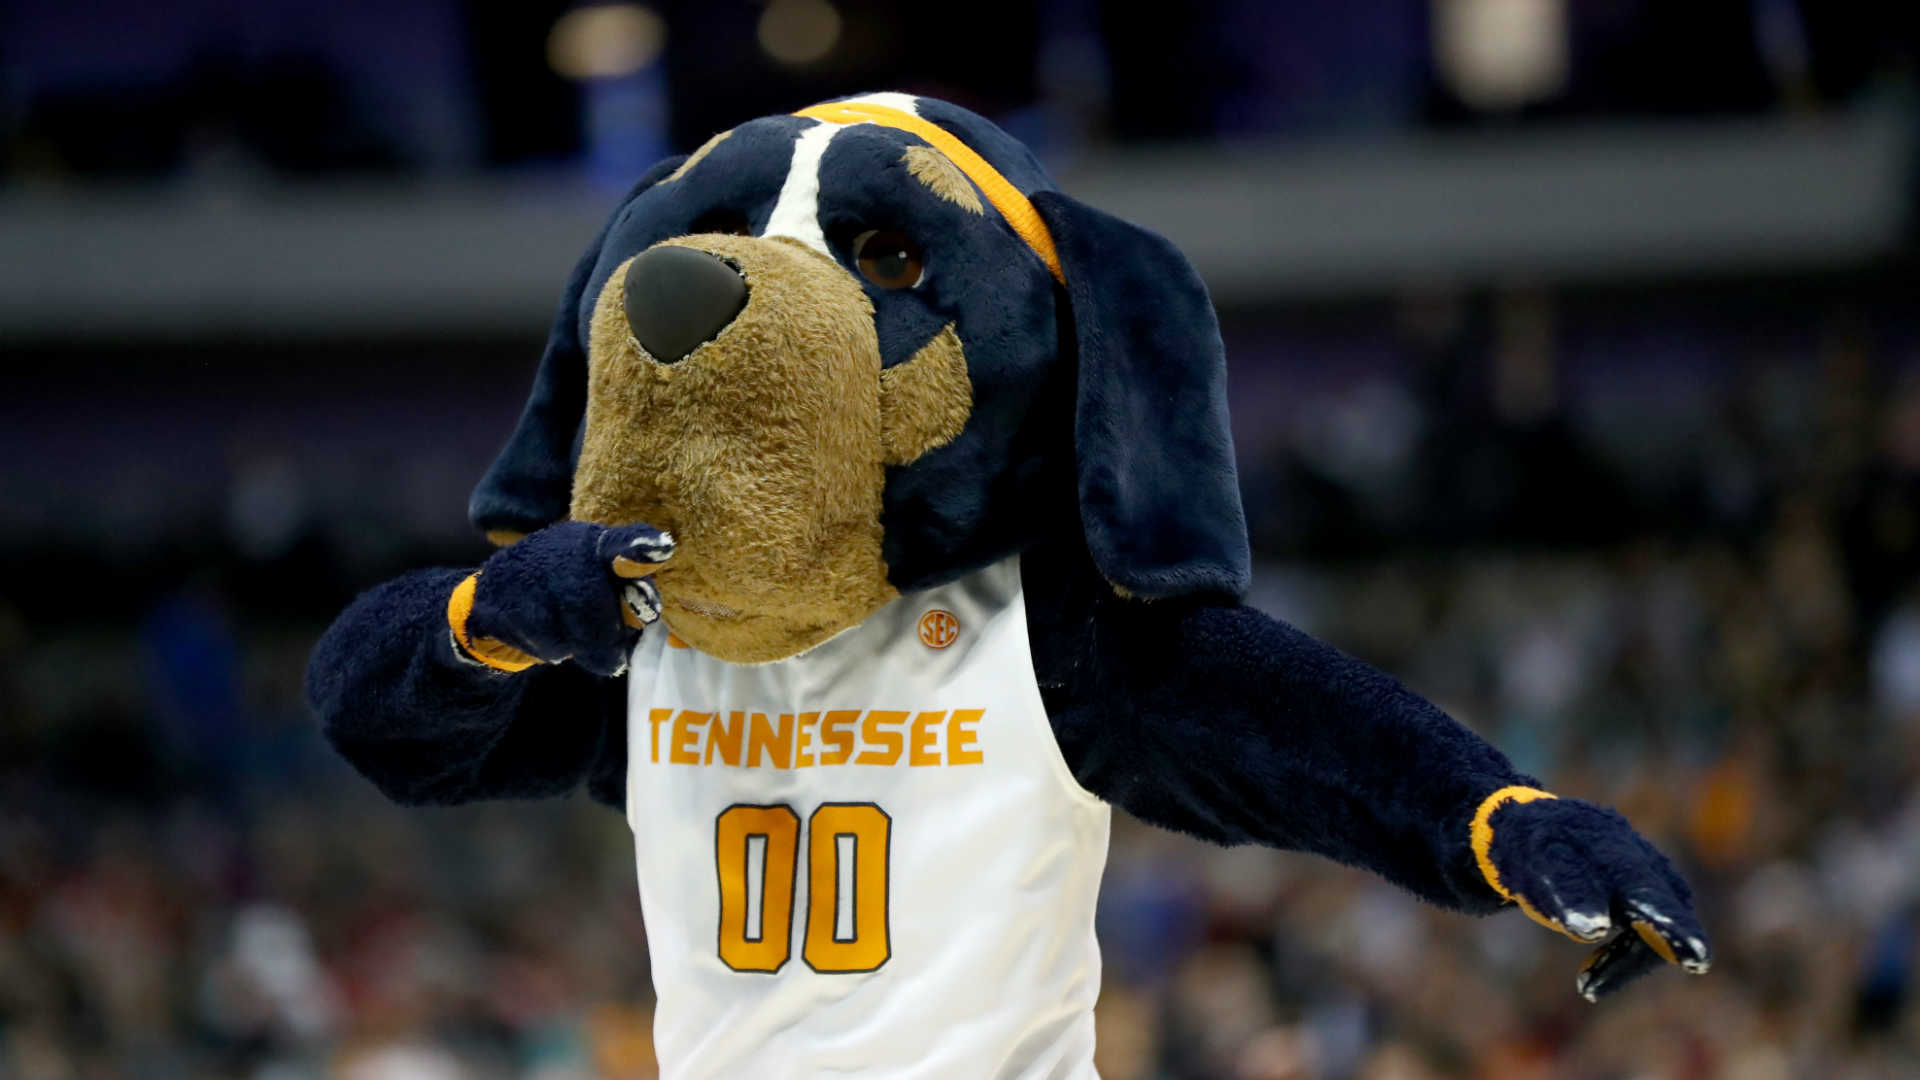 Tennessee-basketball_td7weo101hxn1lr8cs8oydu2k